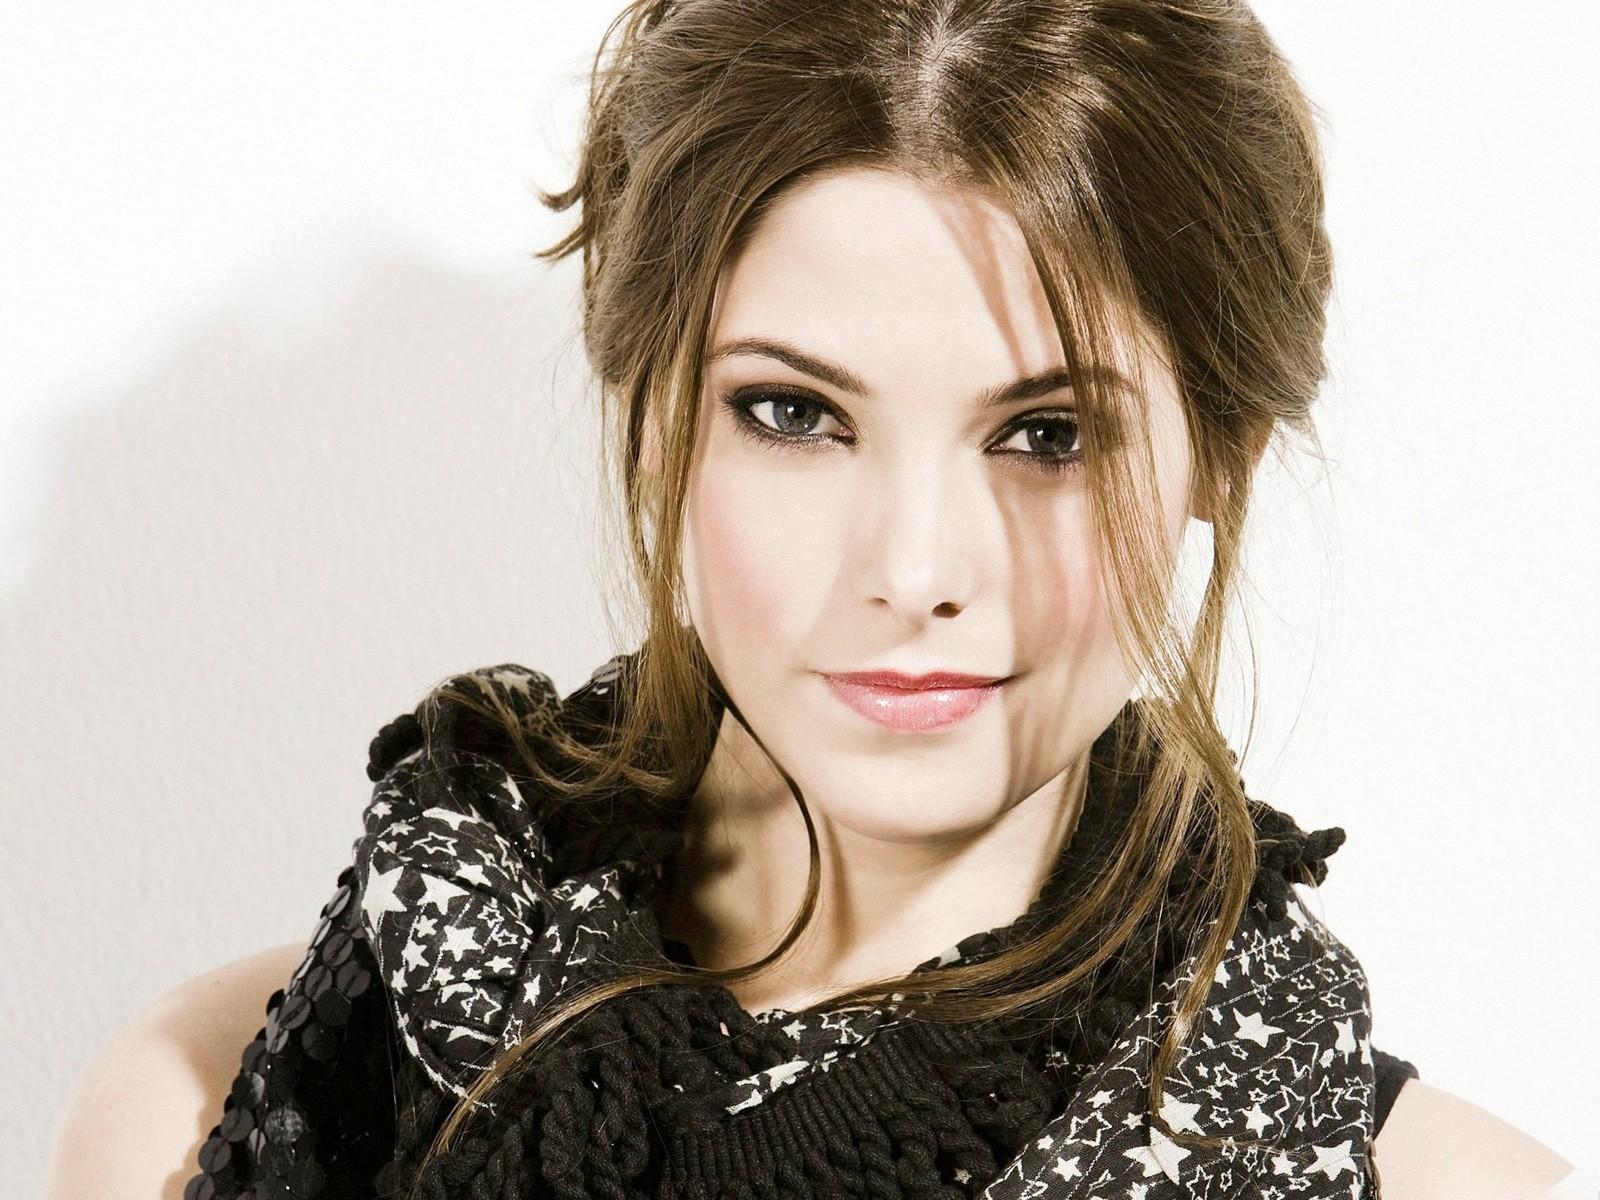 Star Celebrity Wallpapers Ashley Greene Hd Wallpapers: Ashley Greene Twilight Hd Wallpapers